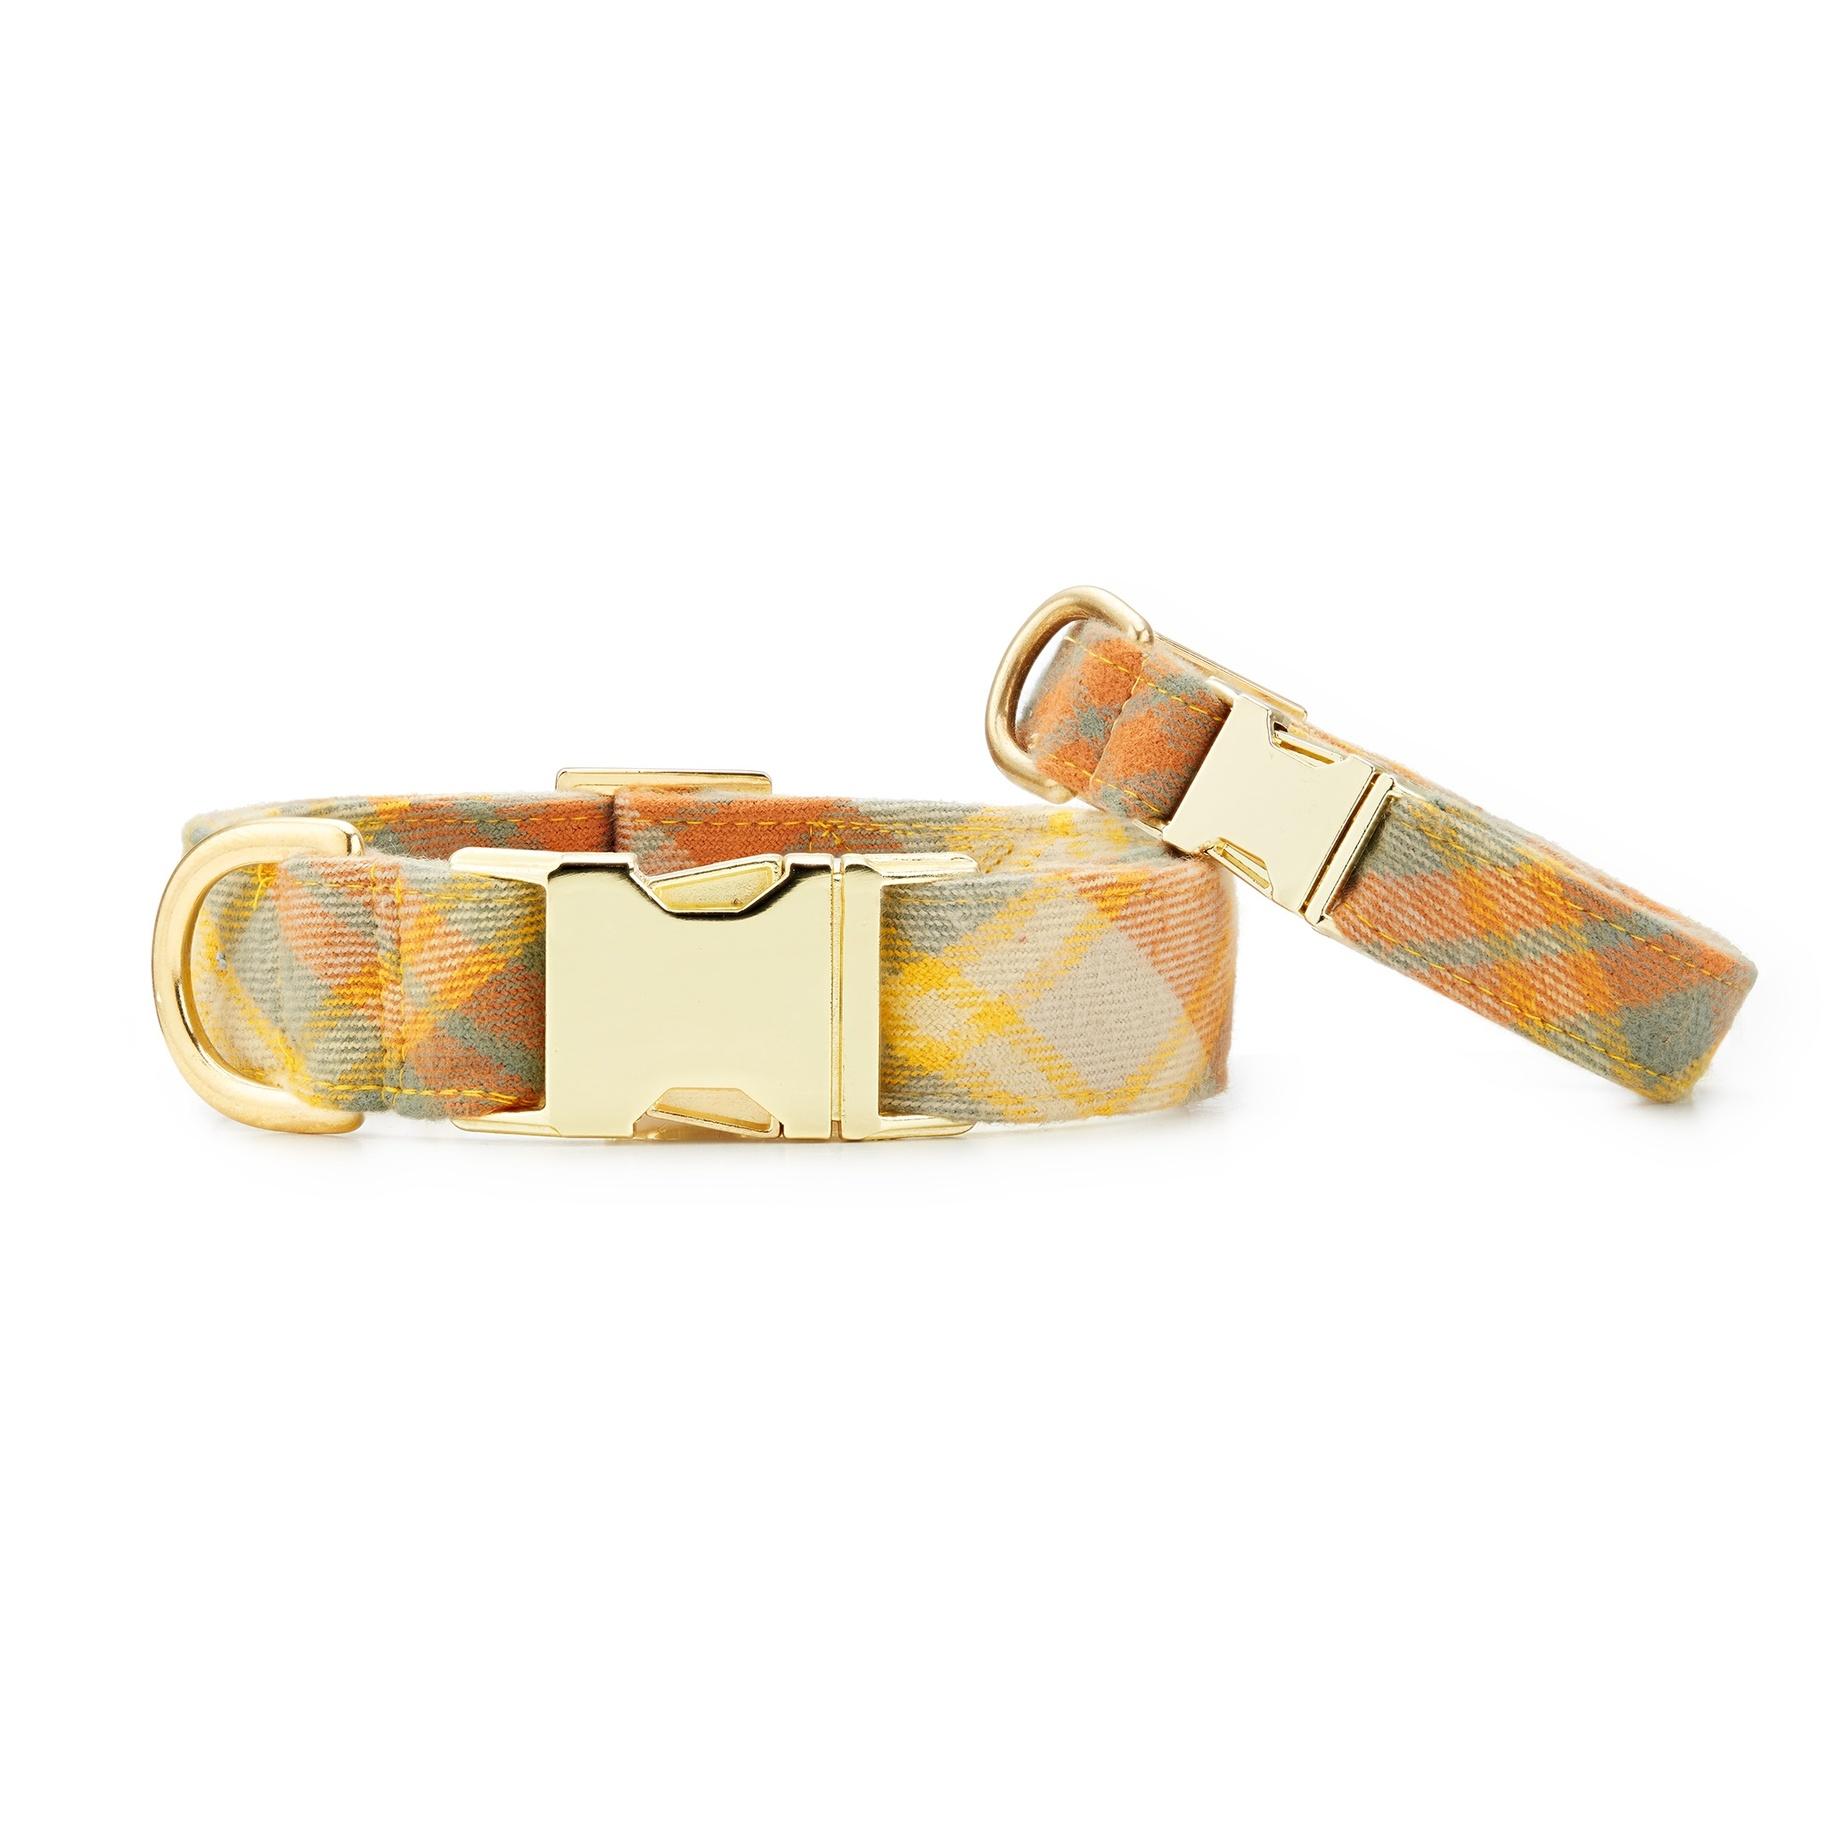 The Foggy Dog Harvest Plaid Flannel Dog Collar